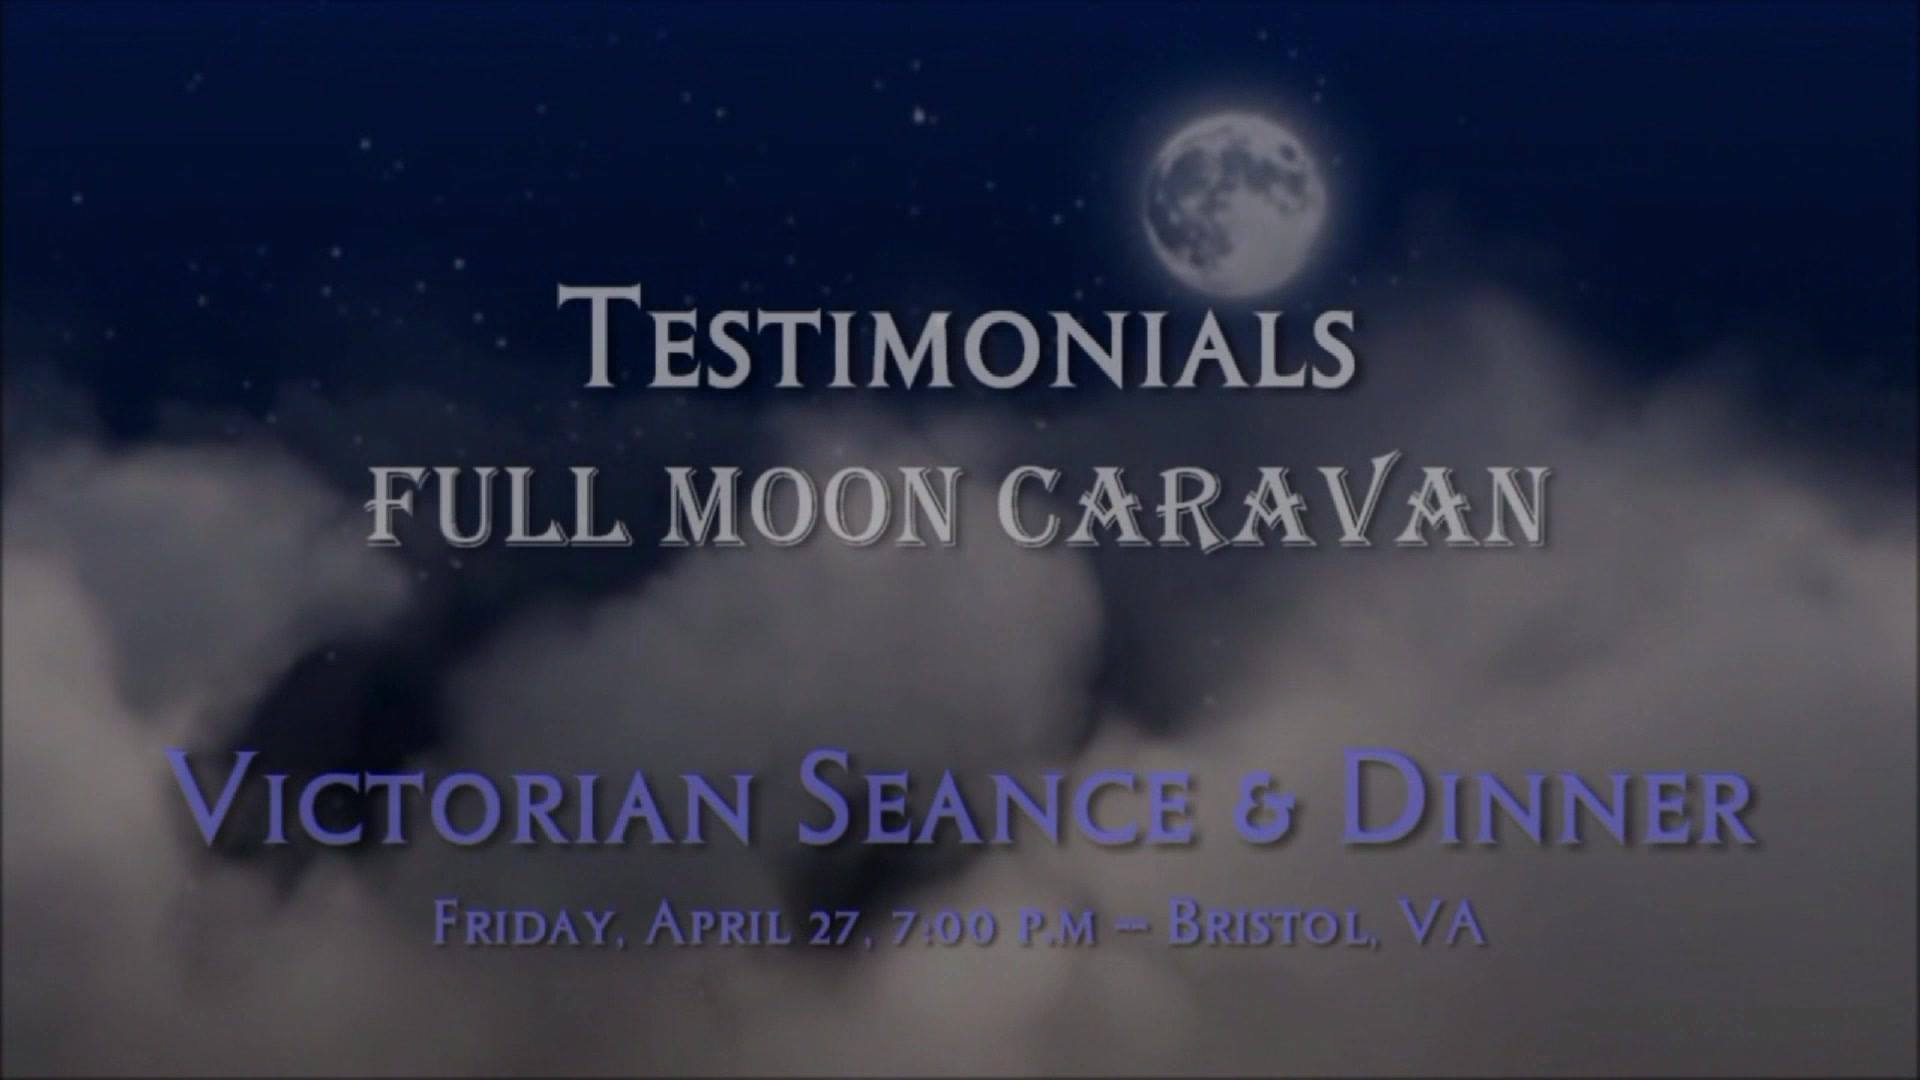 Full Moon Caravan